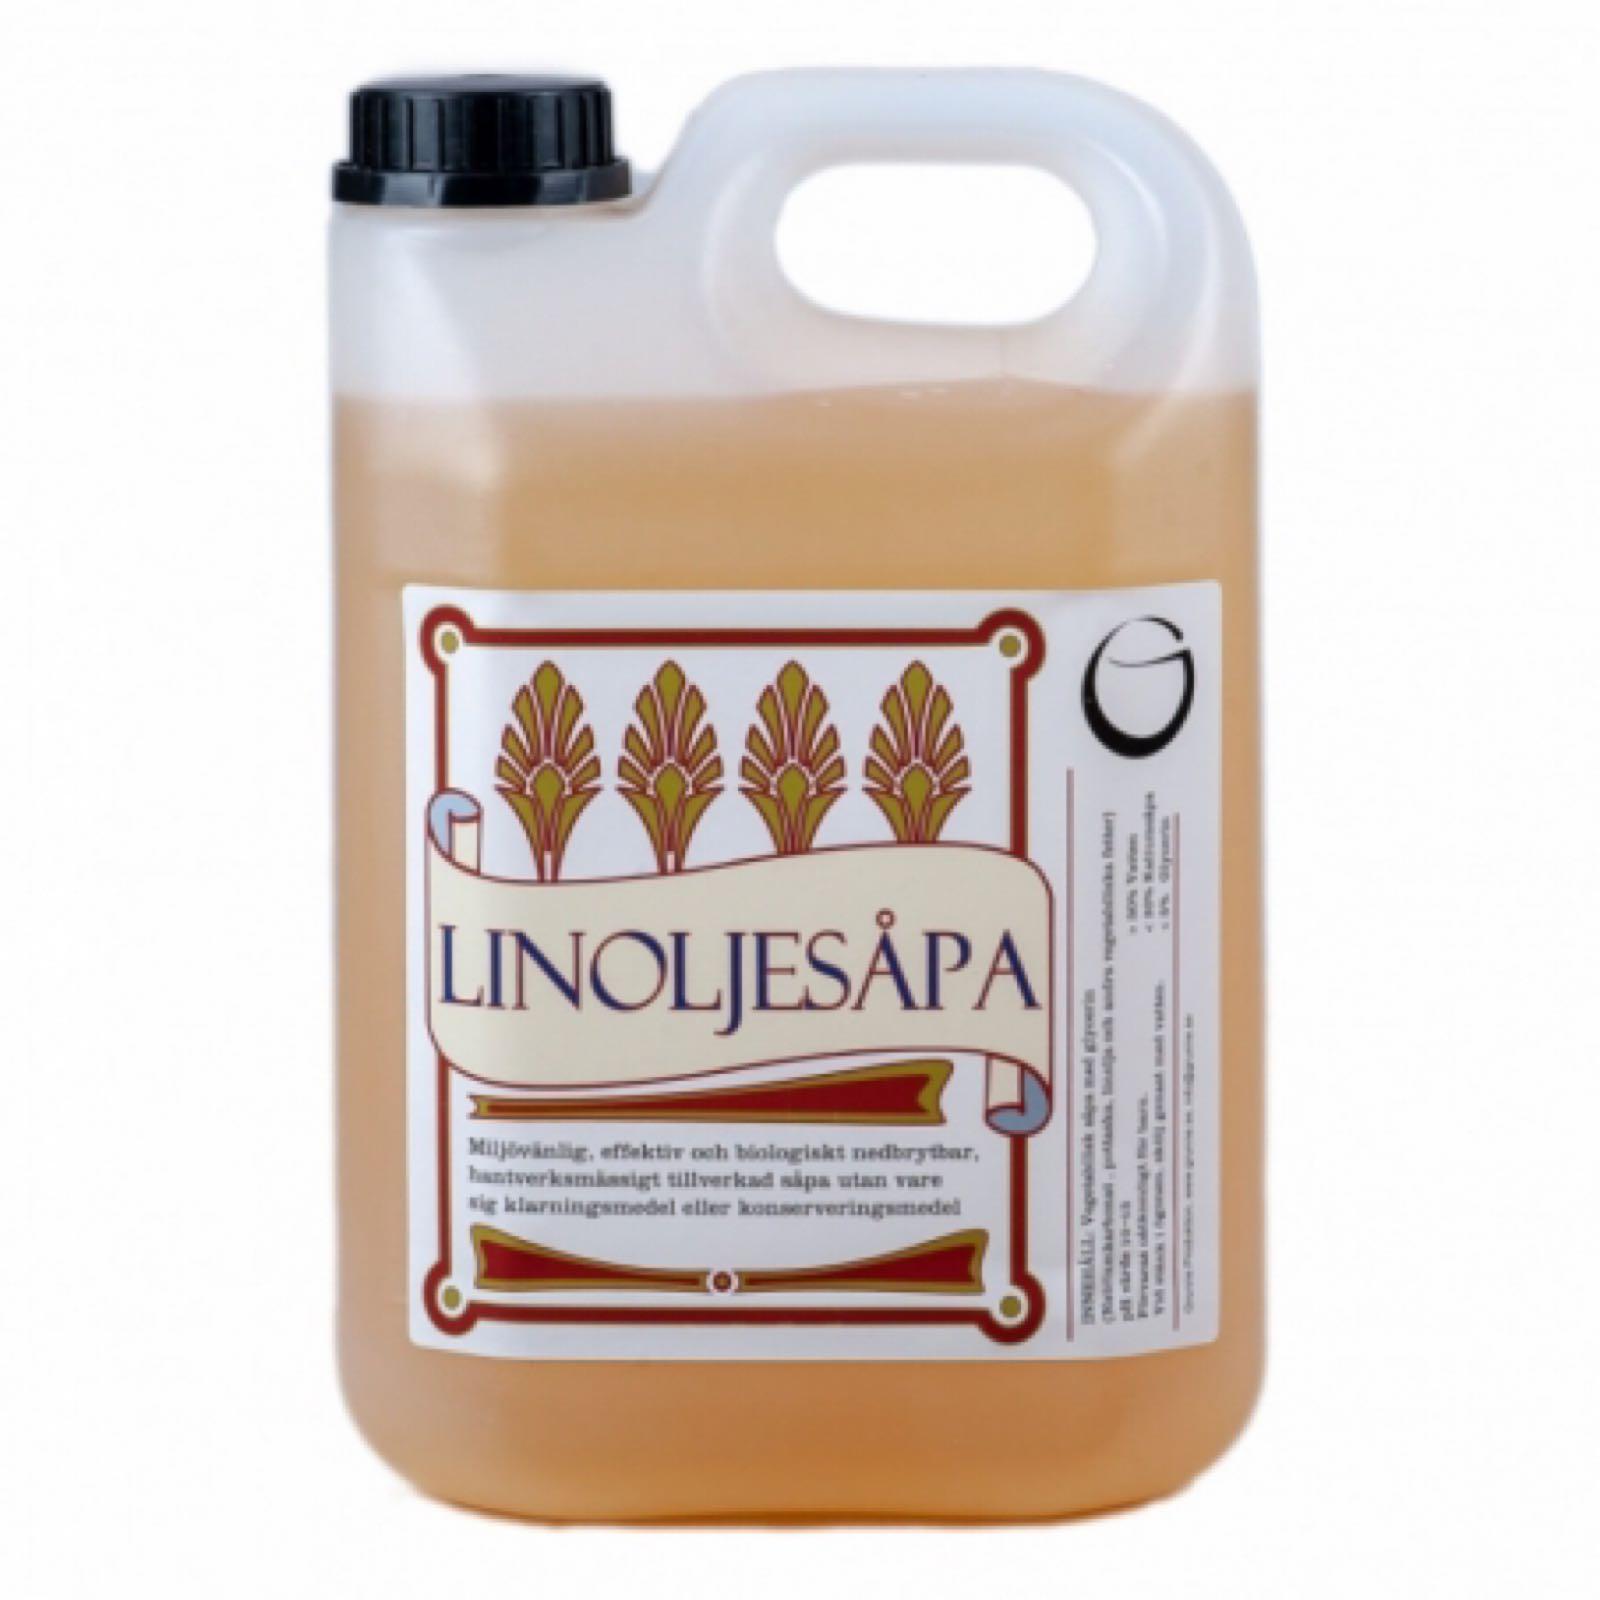 Linoljesåpa, 2,5 liter